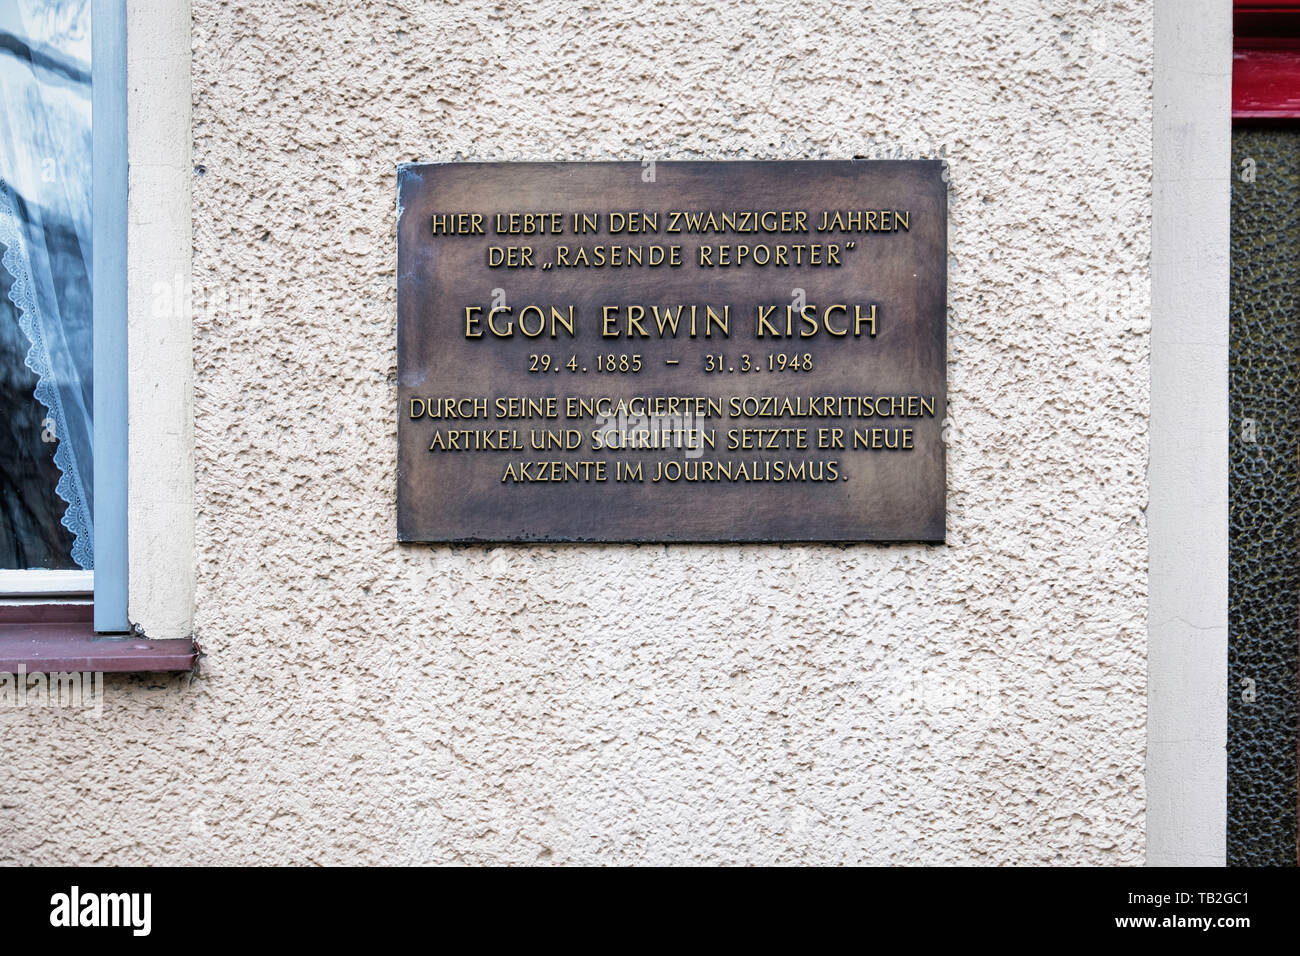 Hohenstaufenstraße 36, Schöneberg-Berlin.Memorial Plaque on house where Egon Erwin Kisch lived.Anti-war, Communist reporter & writer who opposed Hitle - Stock Image